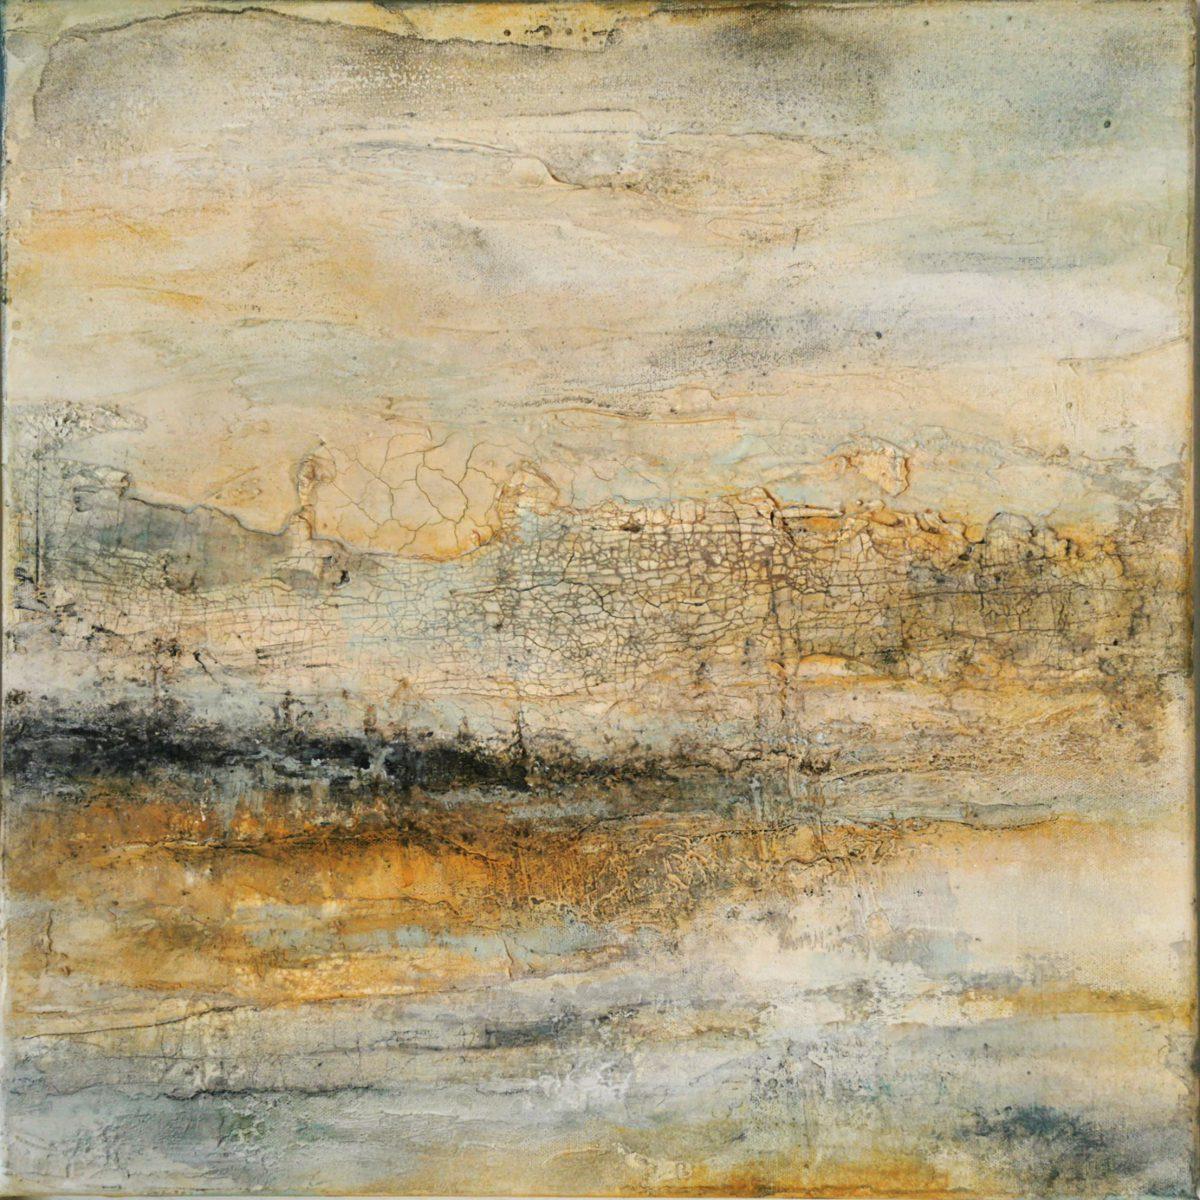 Dagmar Reiche - Landschaft abstrakt 1